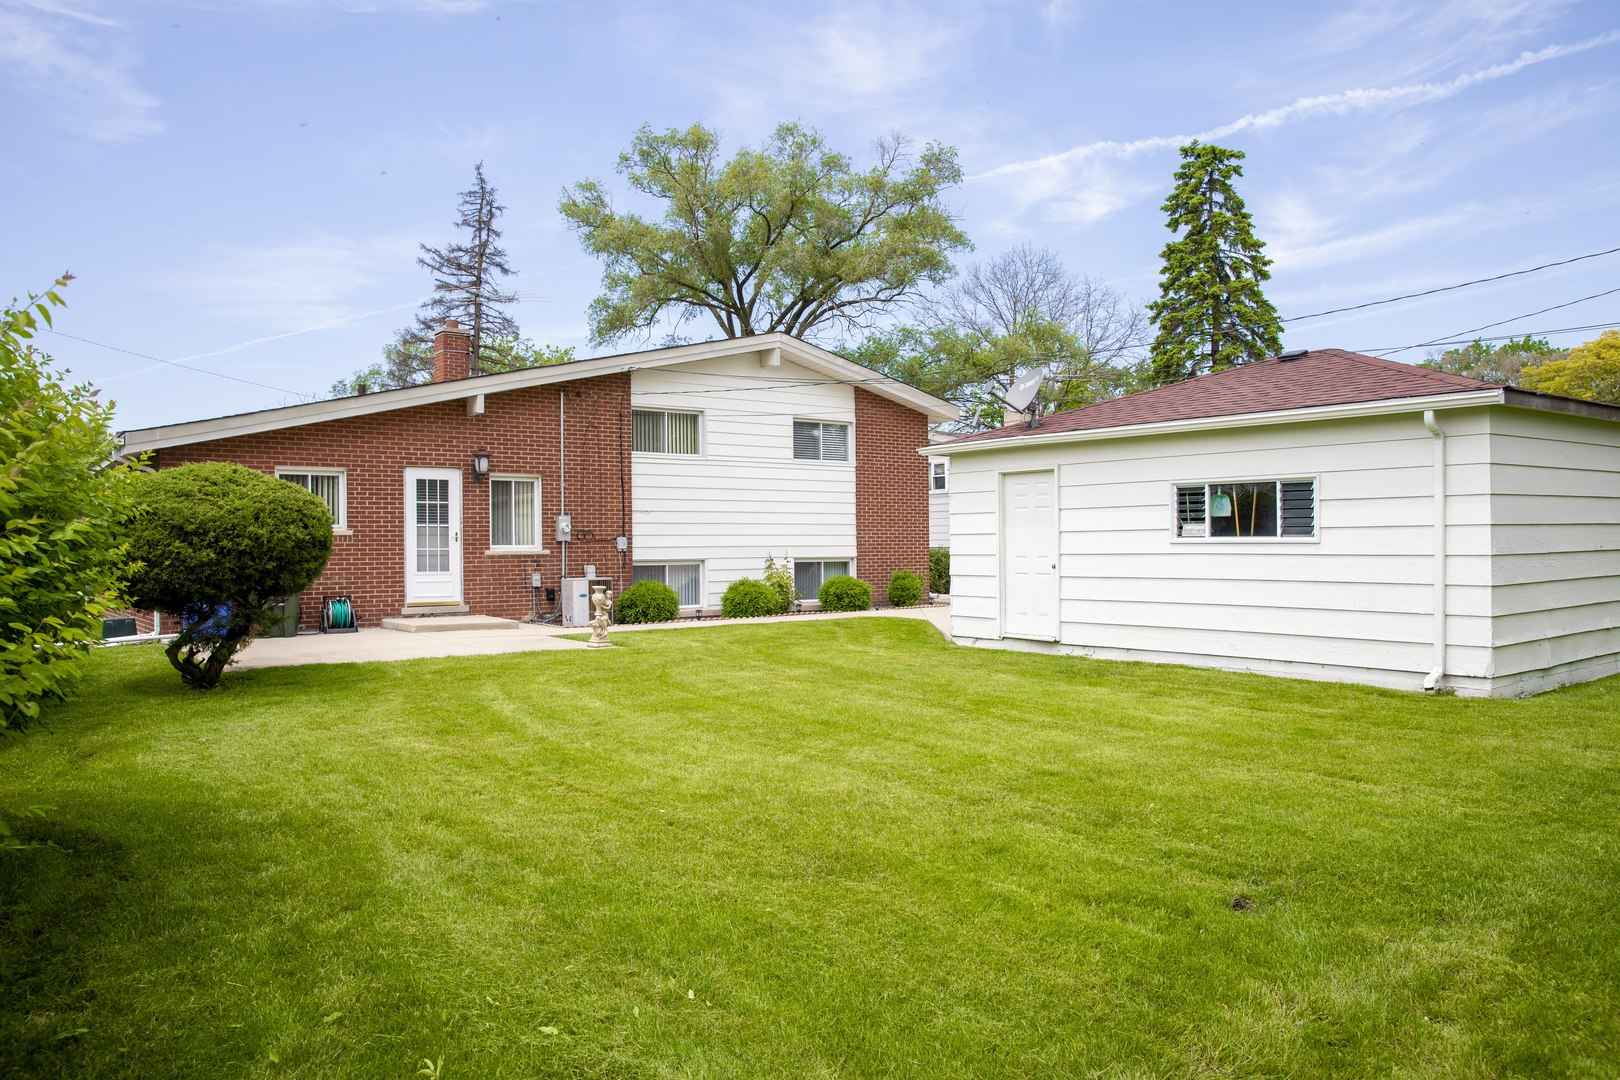 225 Valerie, Glenview, Illinois, 60025